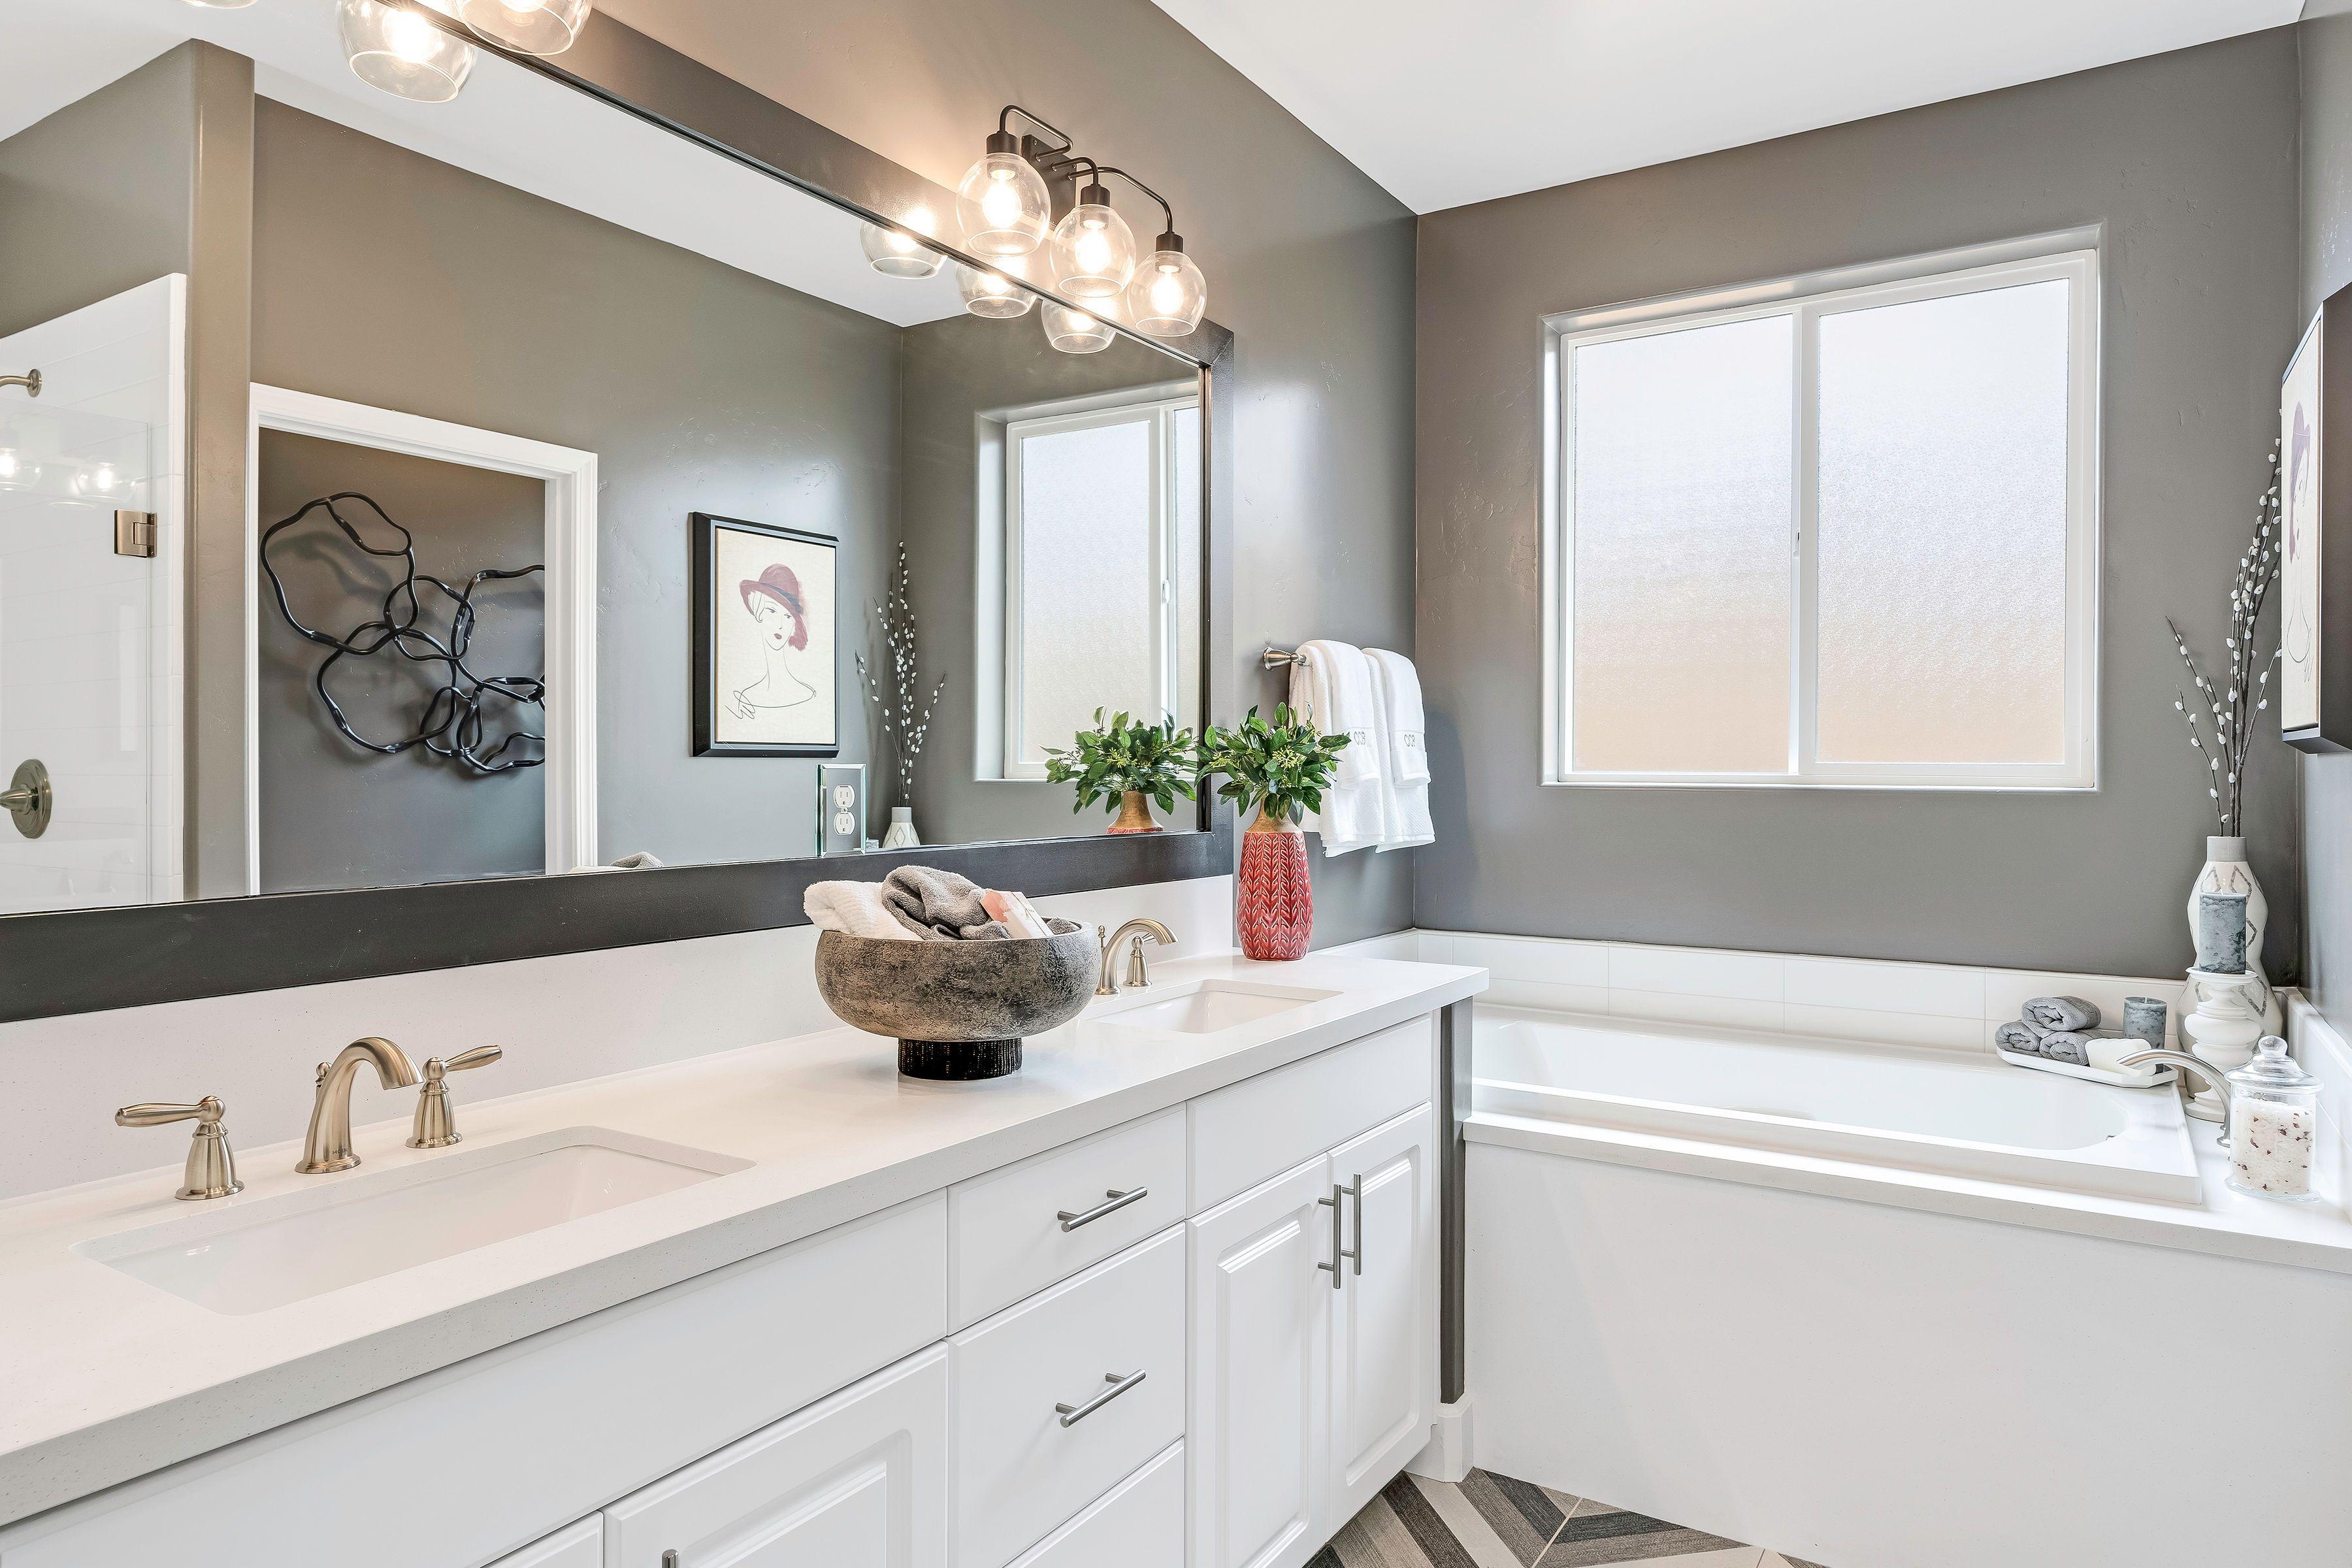 Bathroom featured in the Brookstone By Coastal Community Builders in Santa Barbara, CA